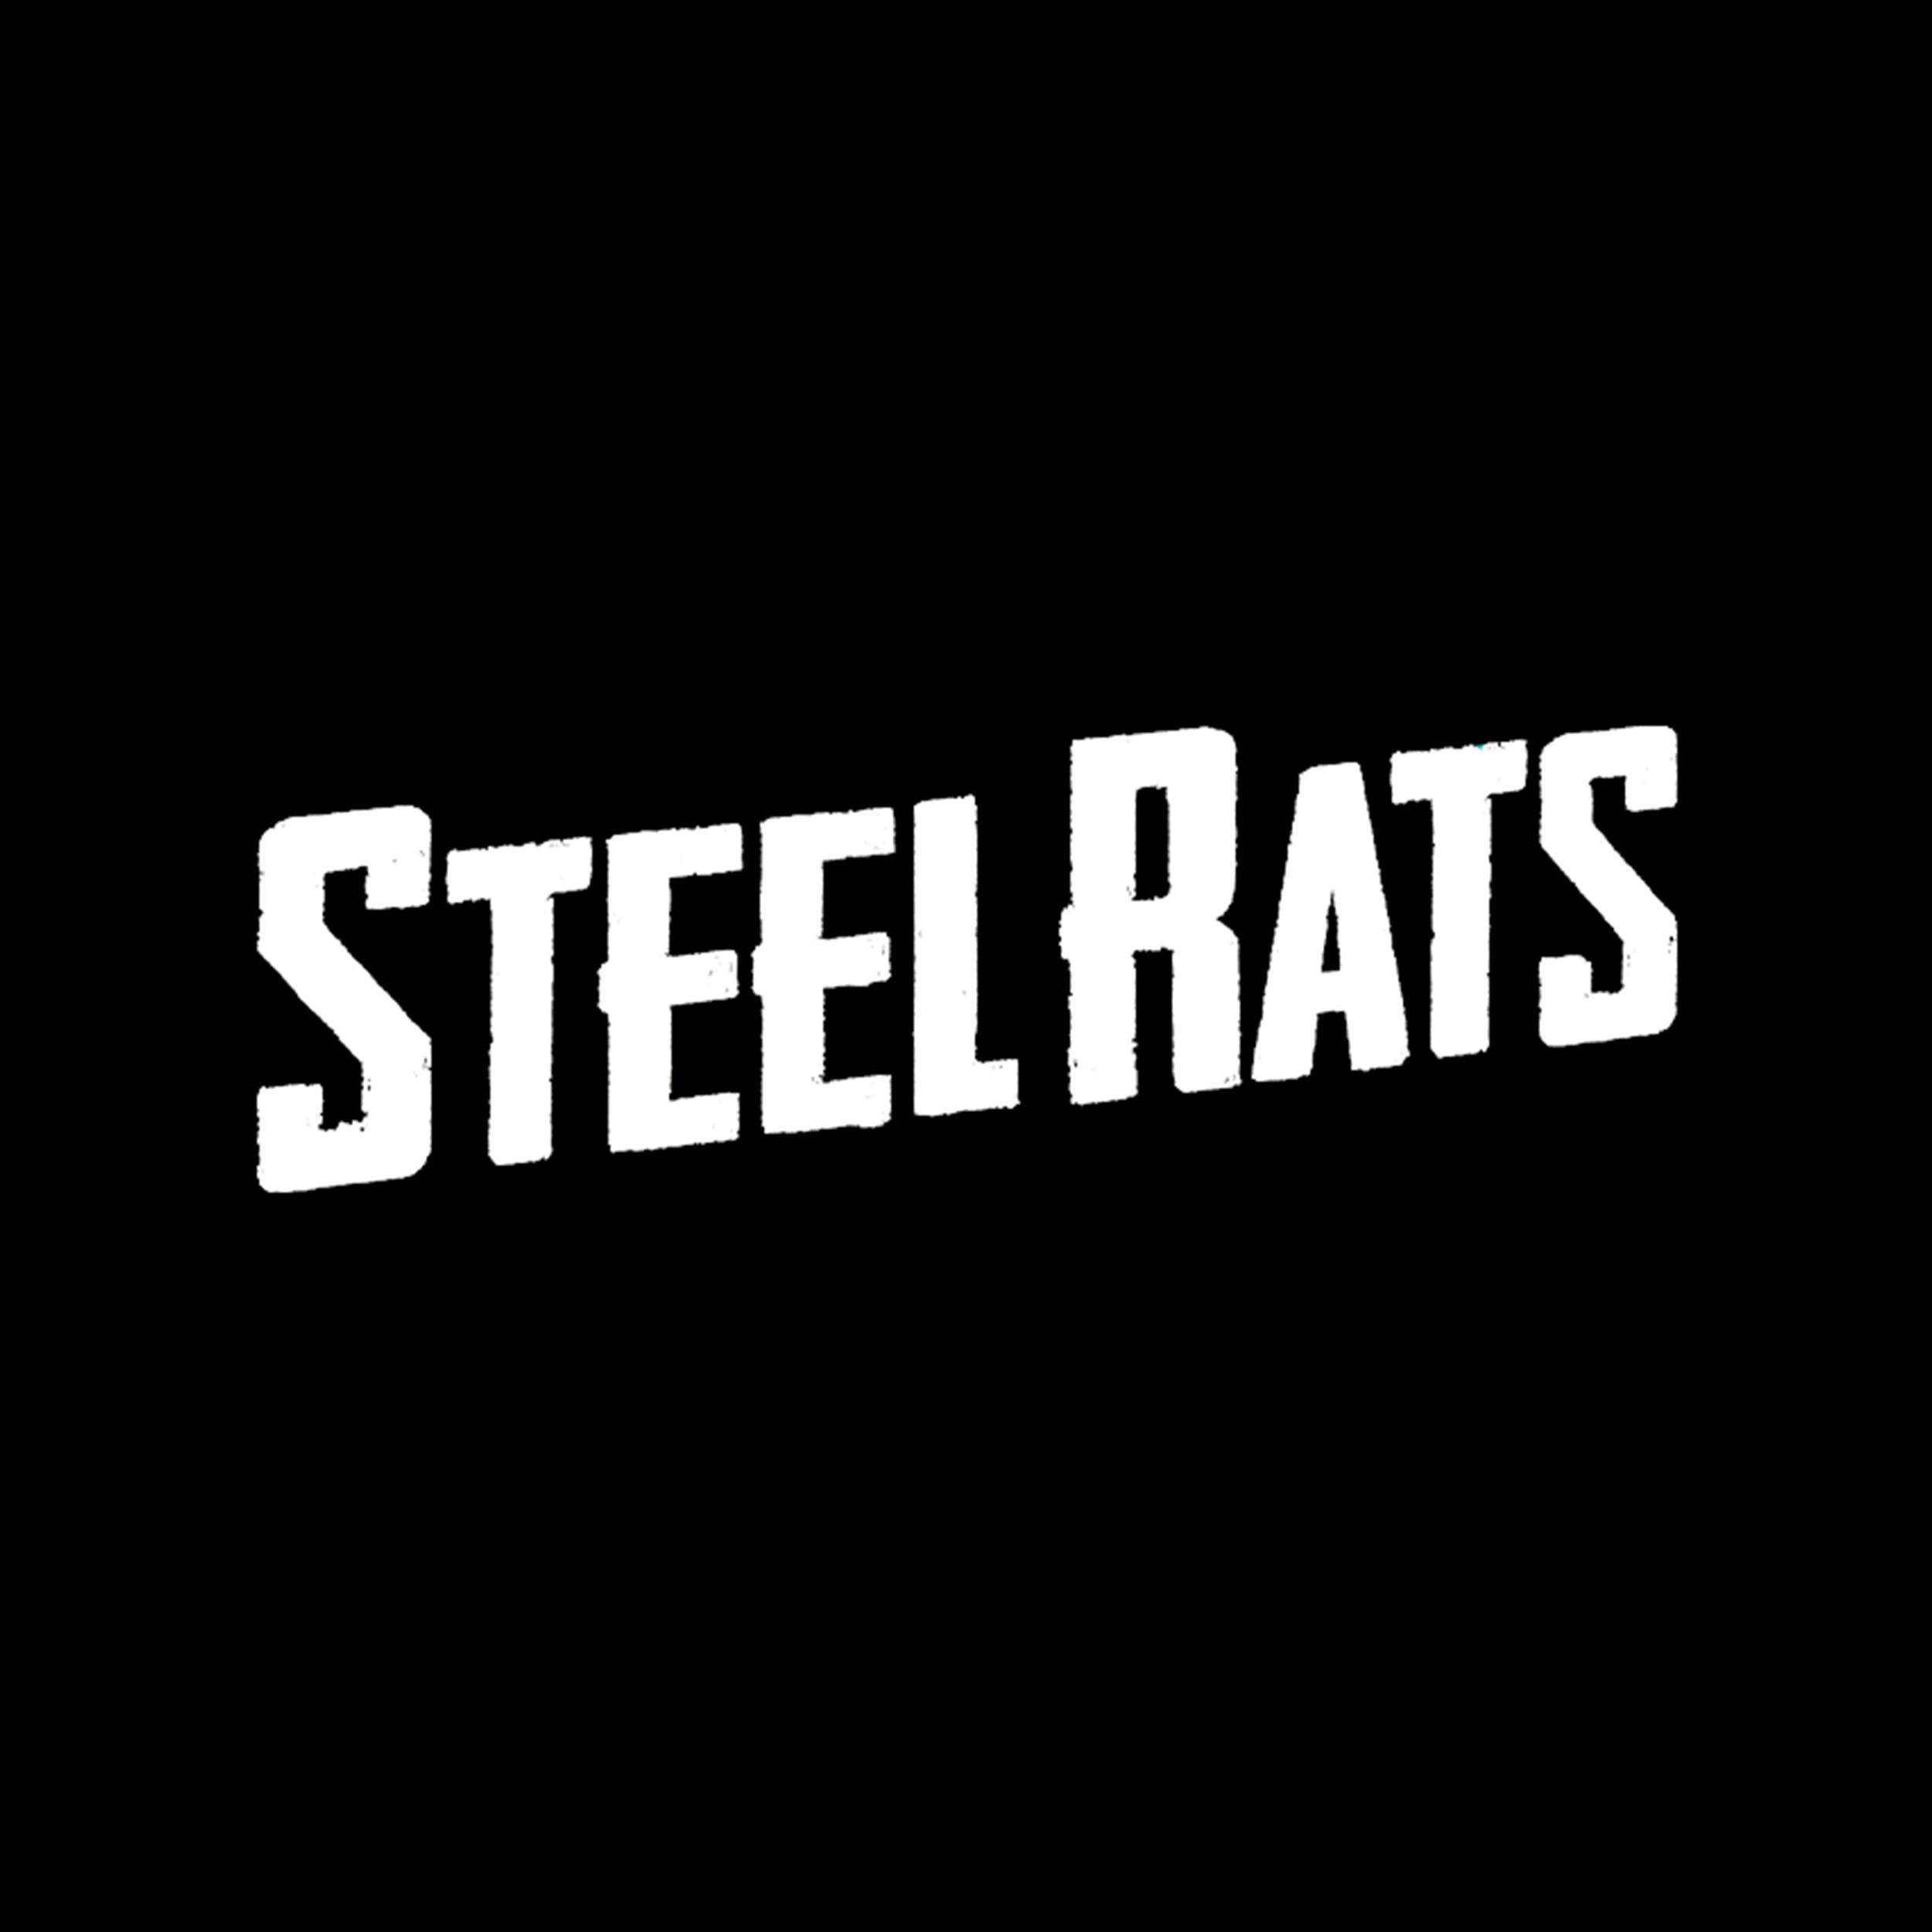 Steel Rats logo